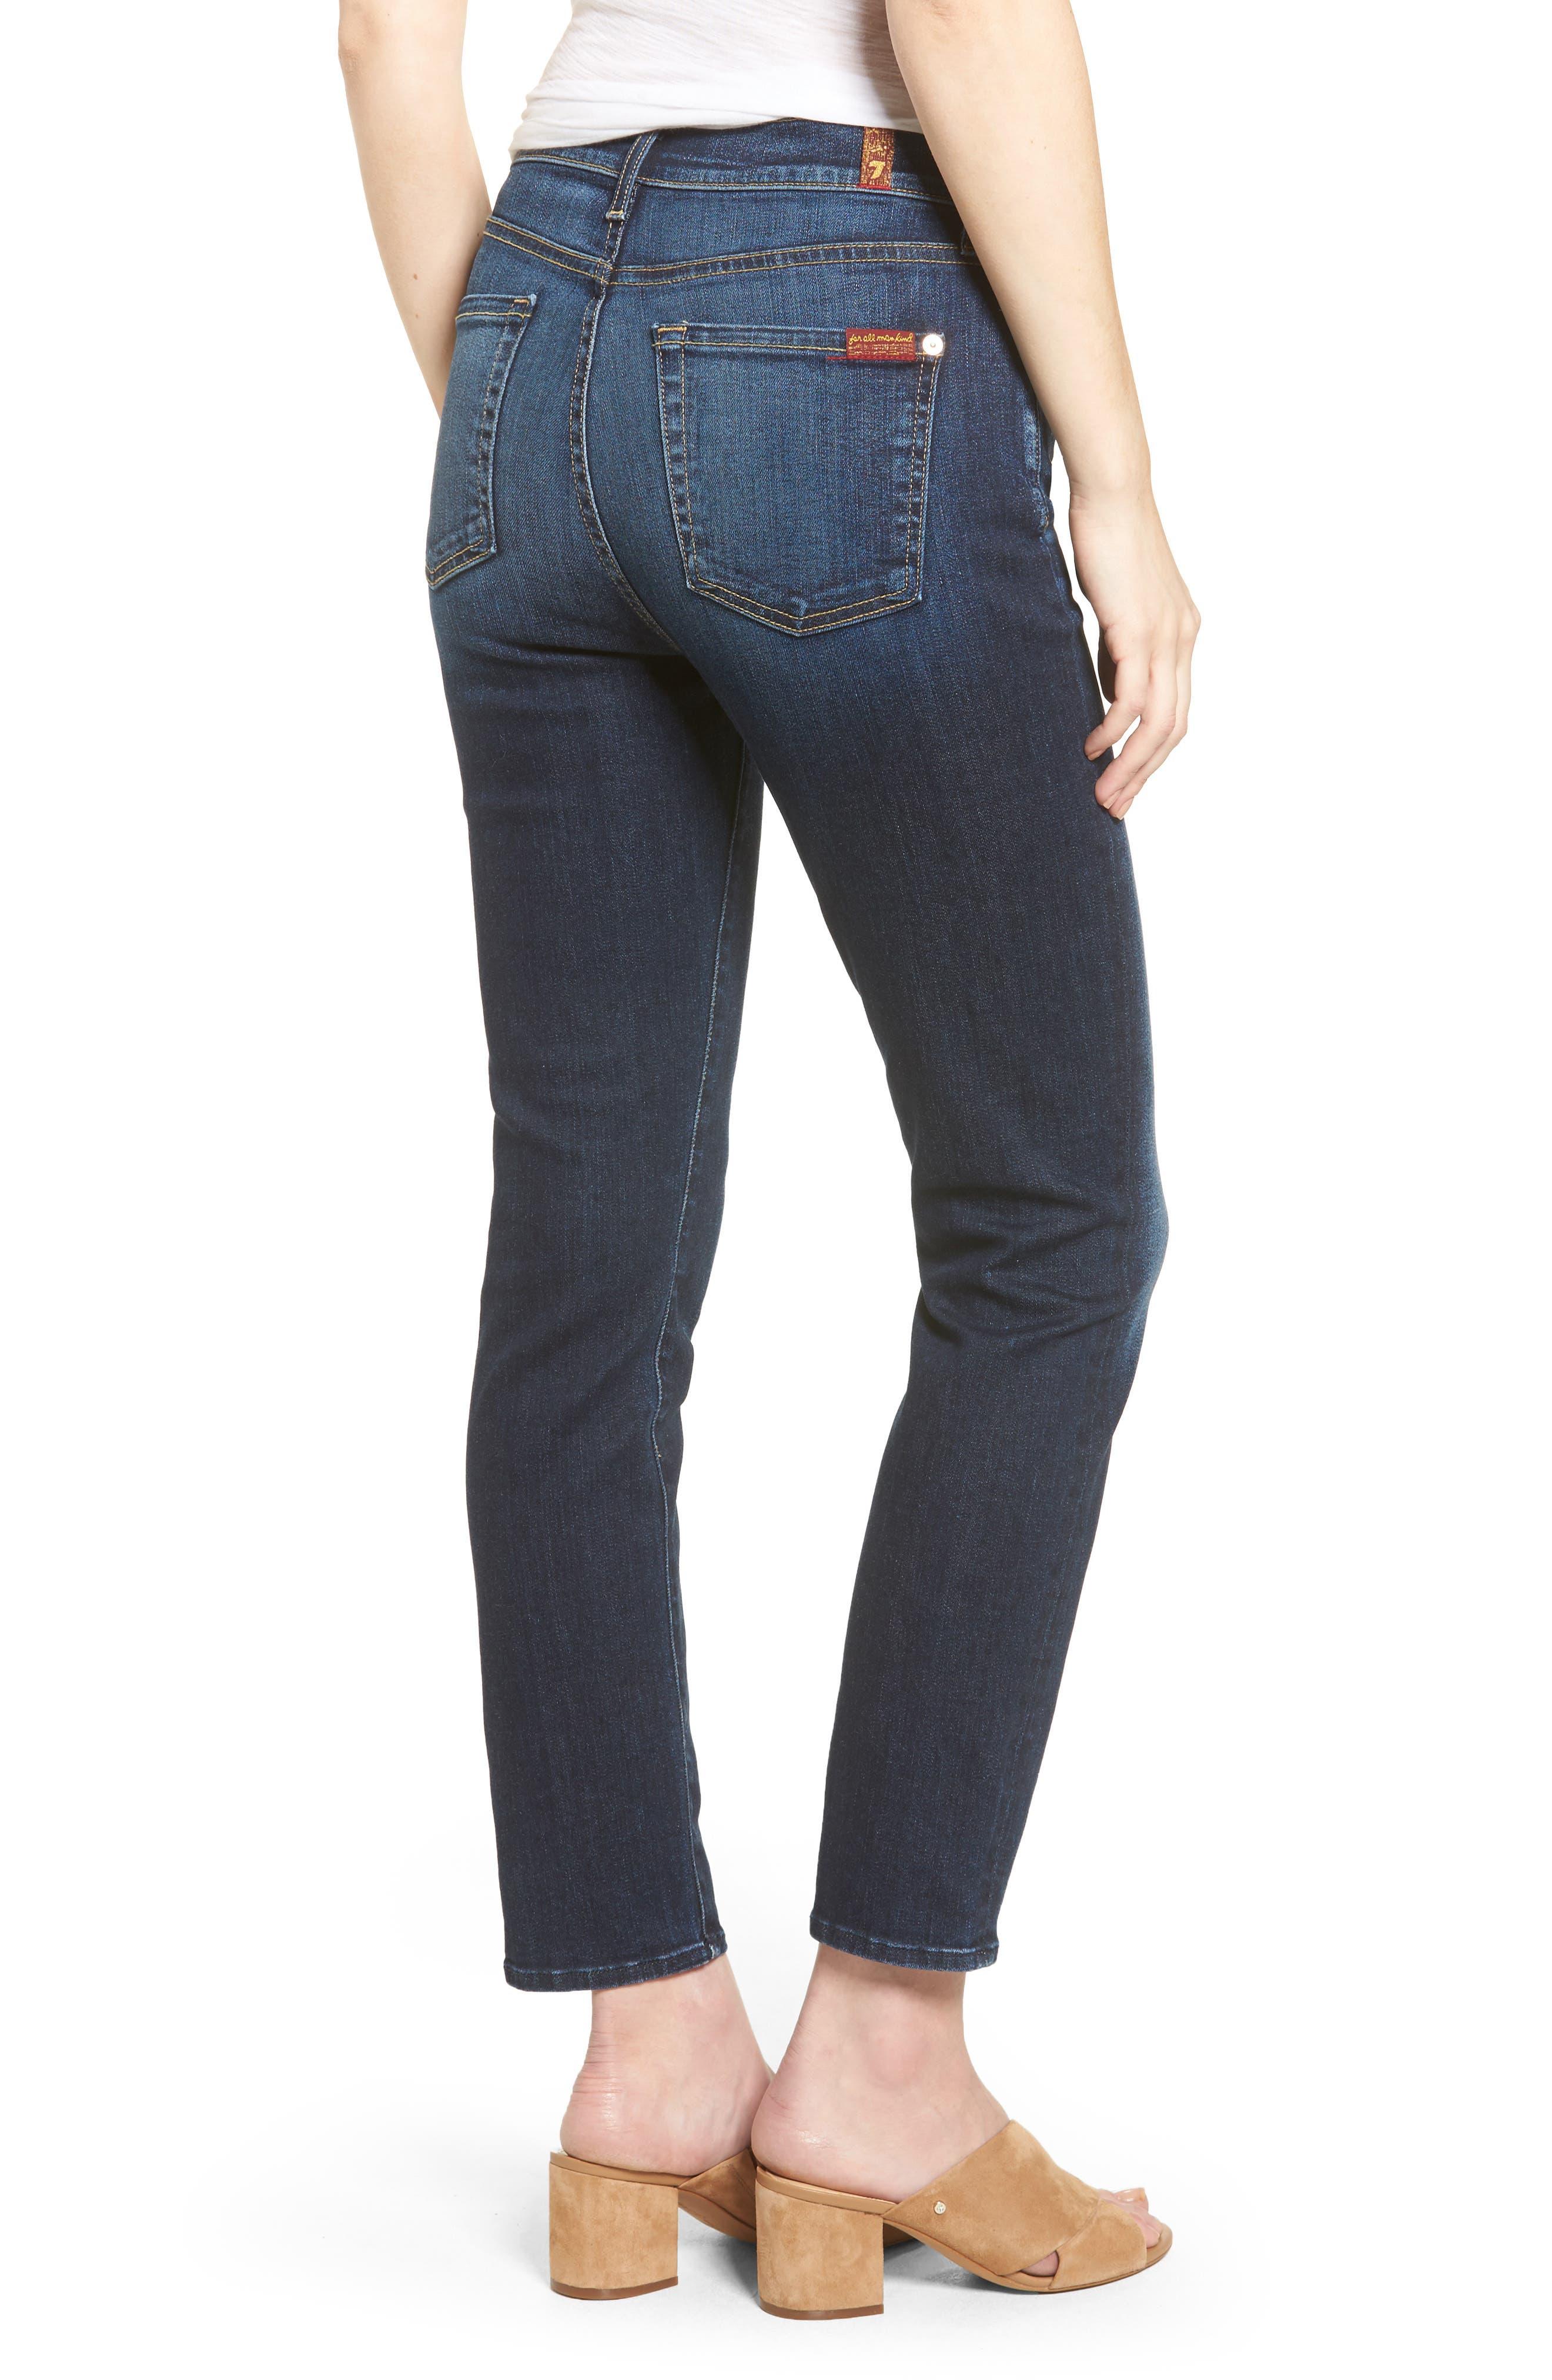 Seven7 Roxanne High Waist Ankle Jeans,                             Alternate thumbnail 2, color,                             Aggressive Madison Ave